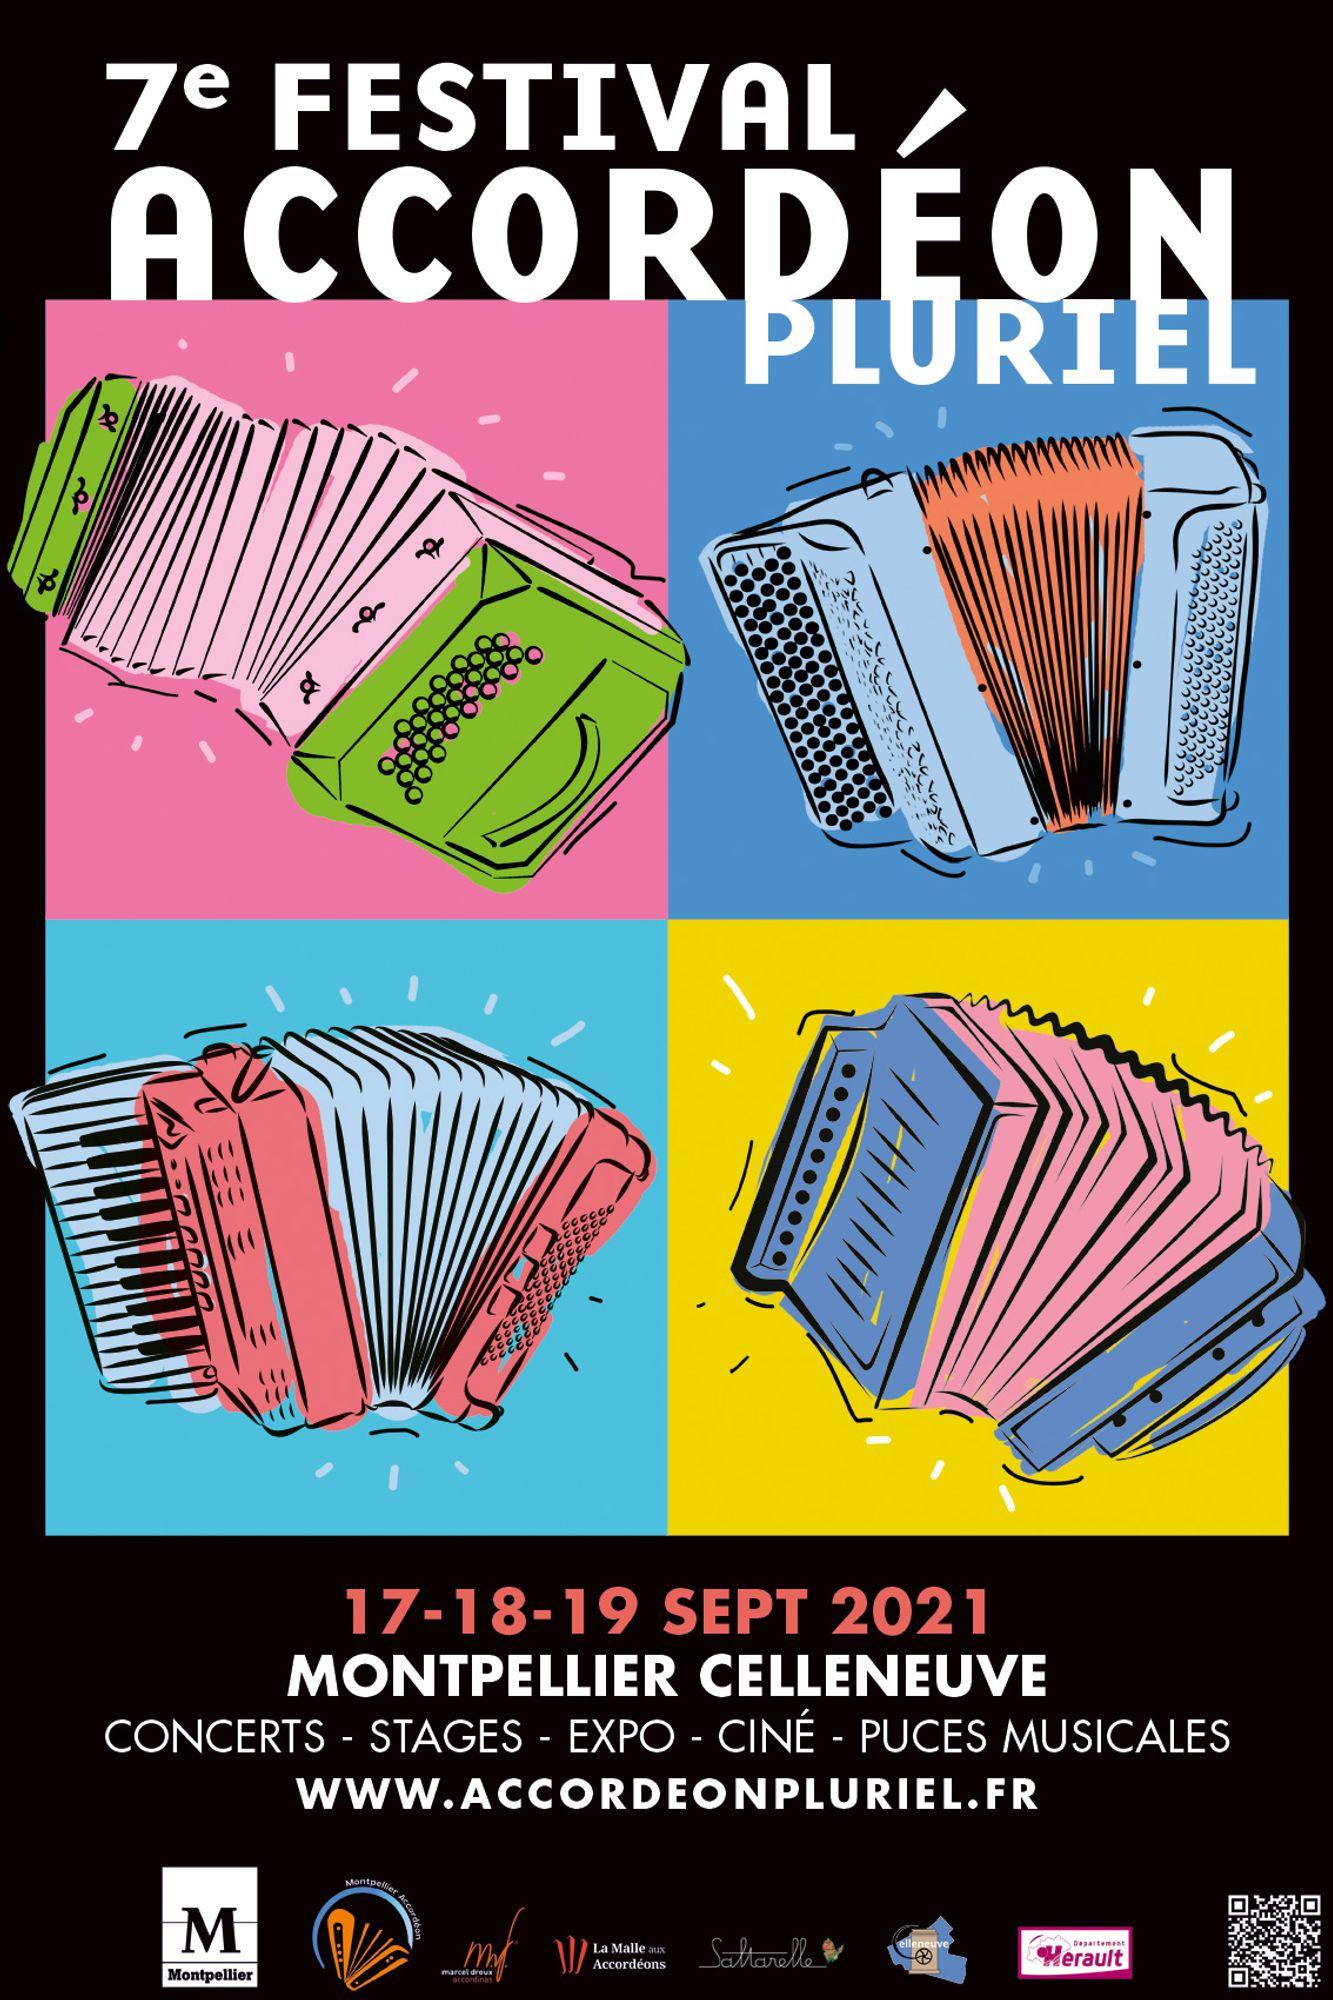 Festival Accordéon Pluriel